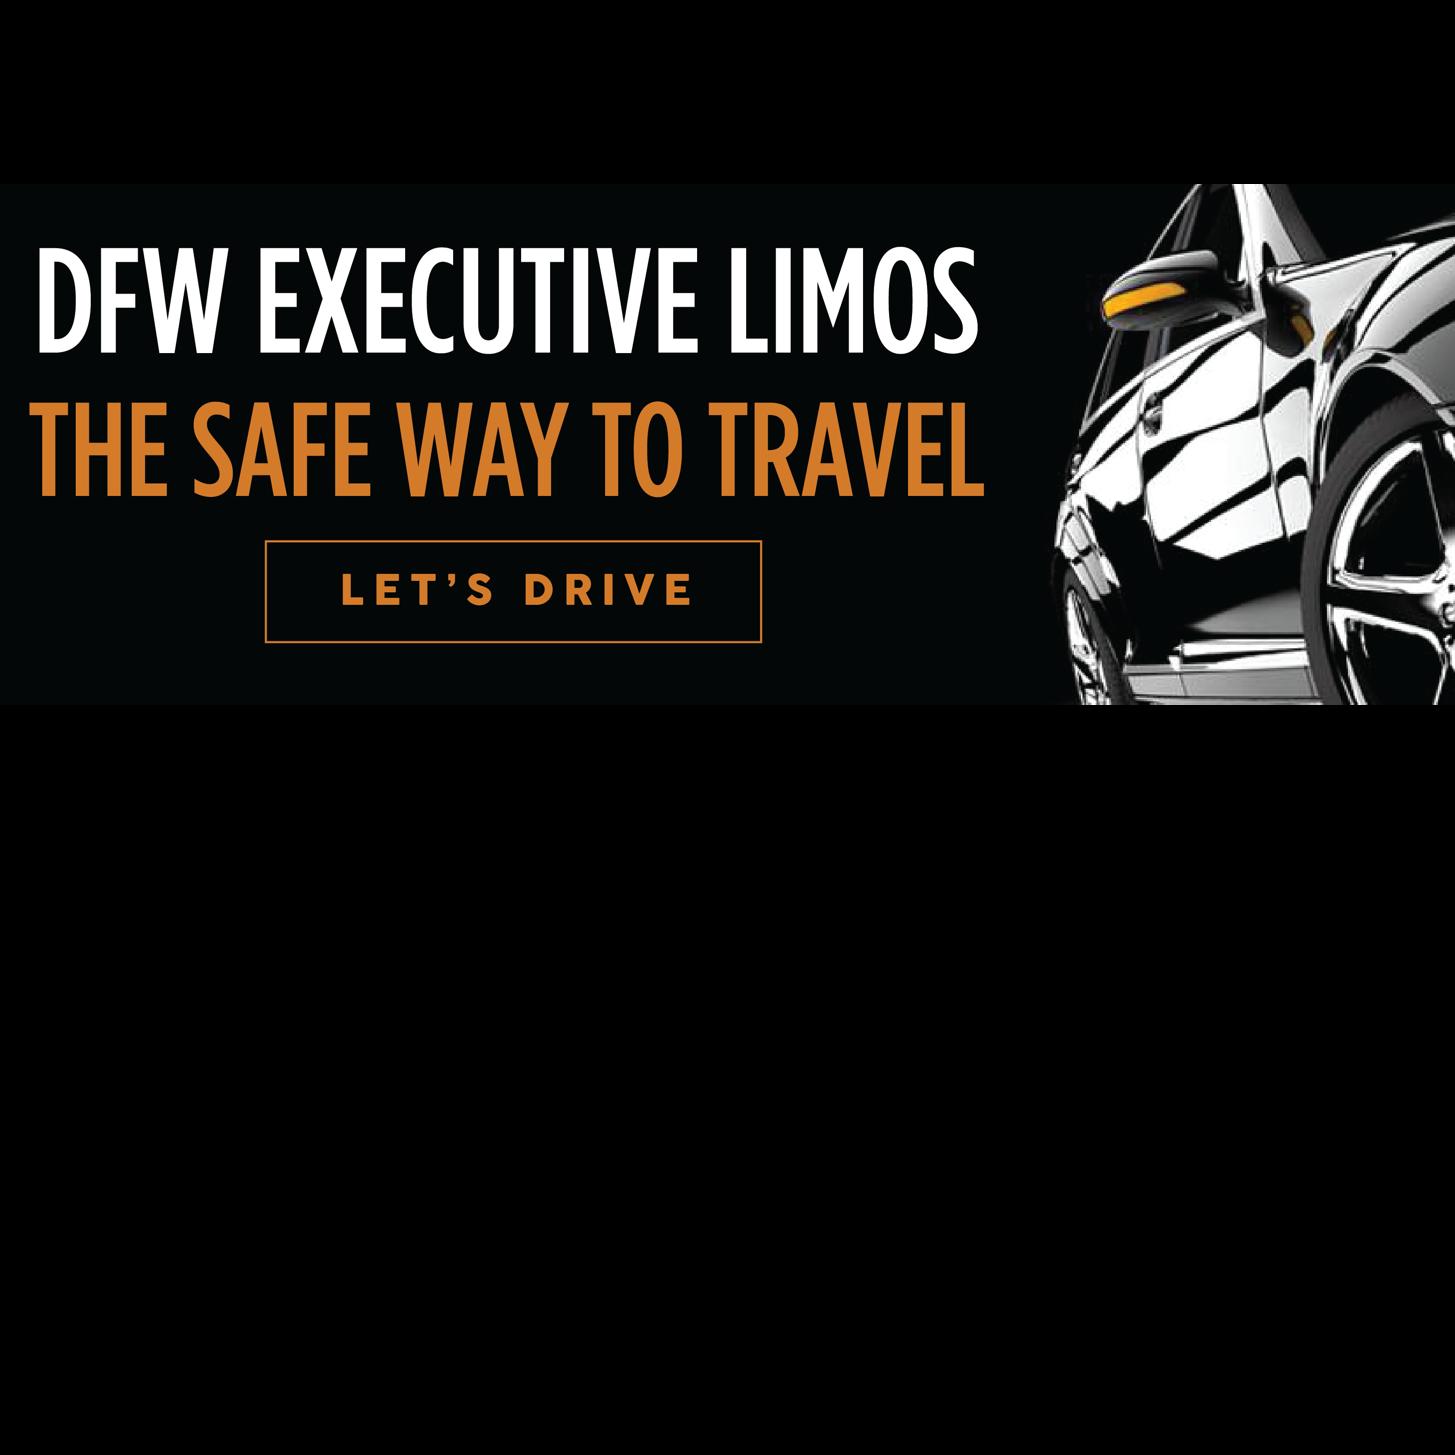 DFW Executive Limos